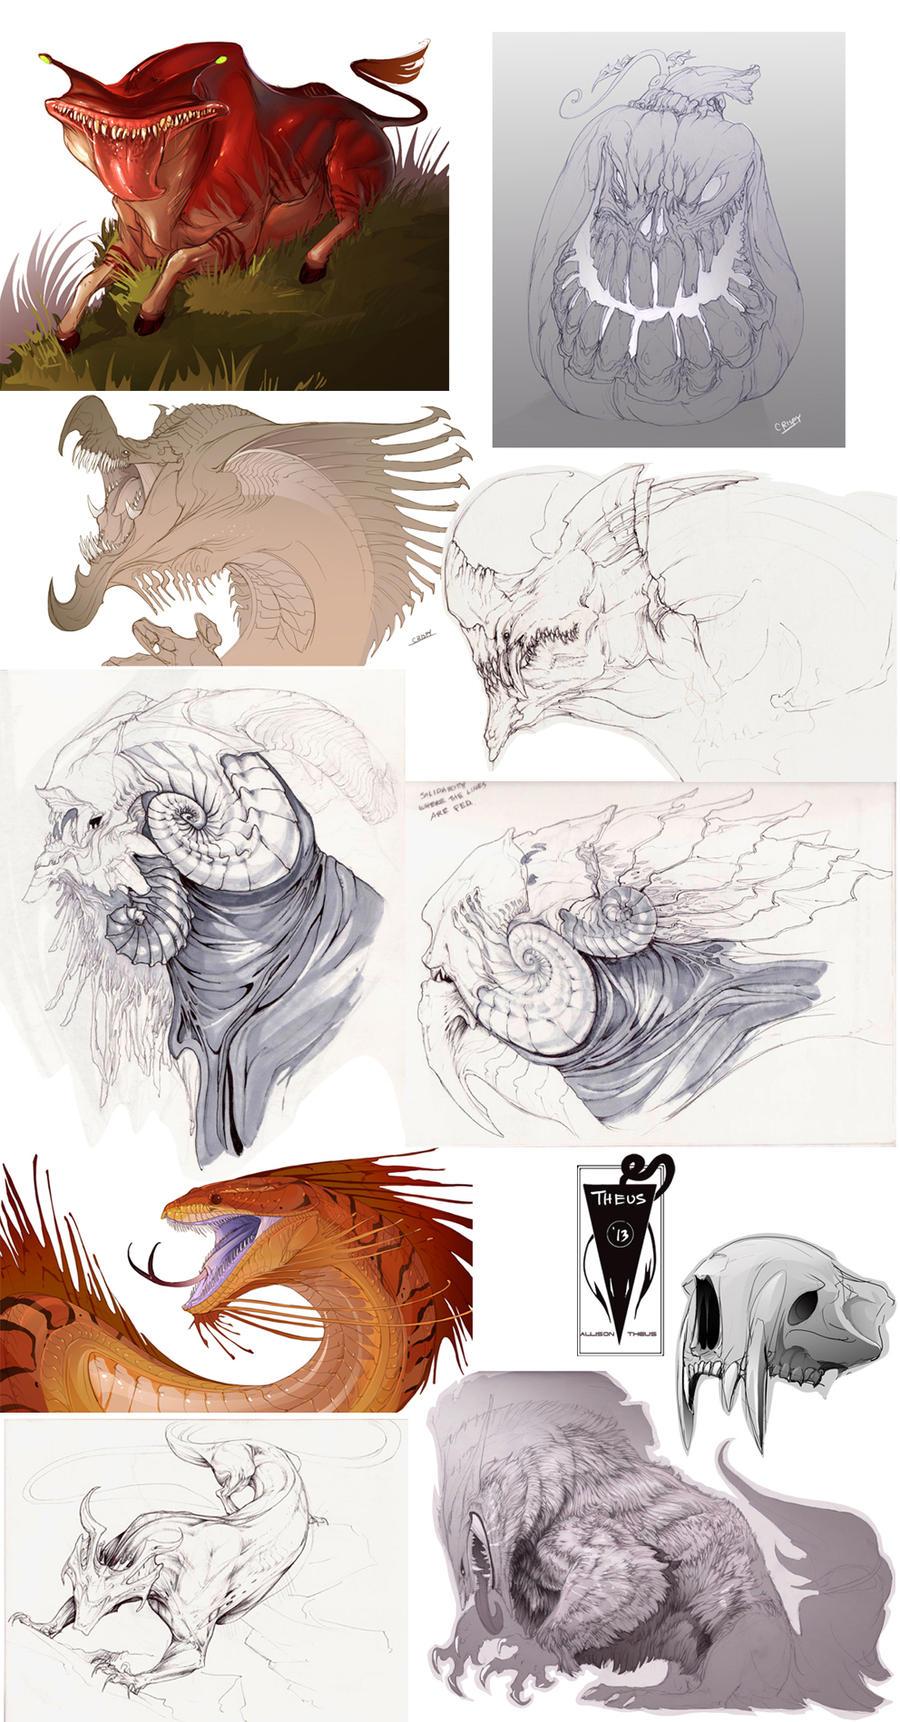 Creature Sketchdump 4 by beastofoblivion